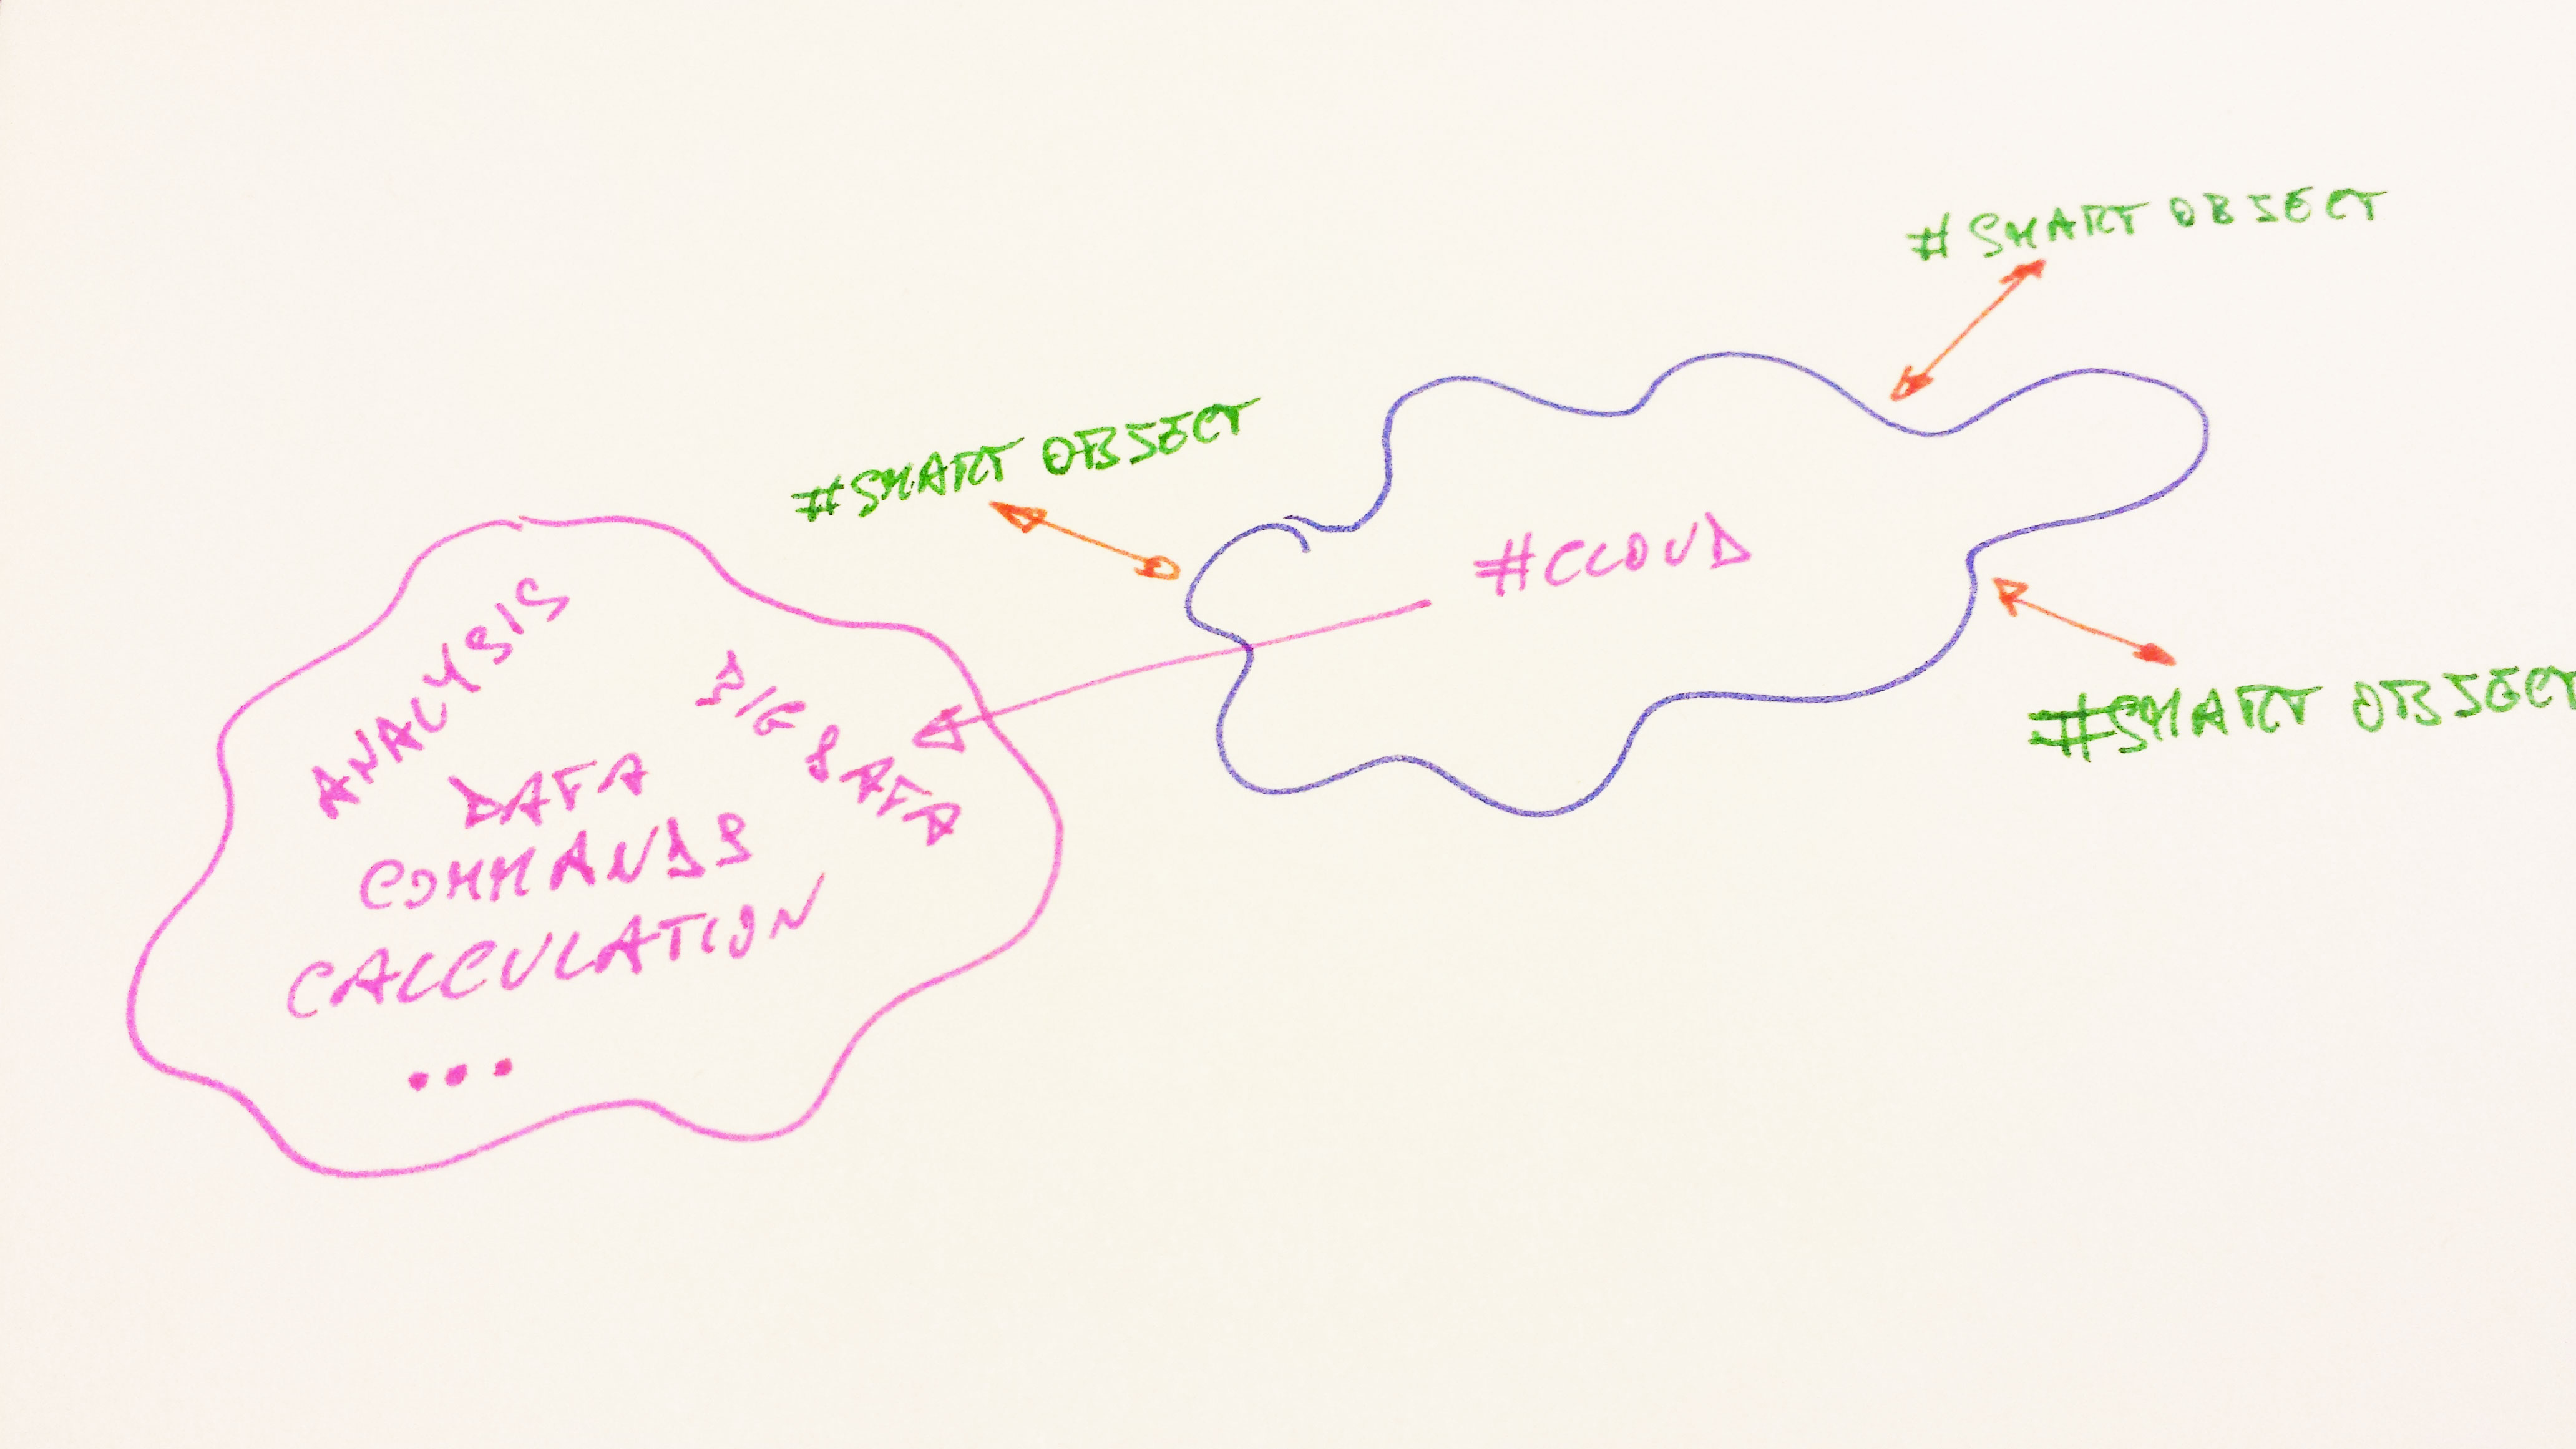 Cloud e Internet of Things